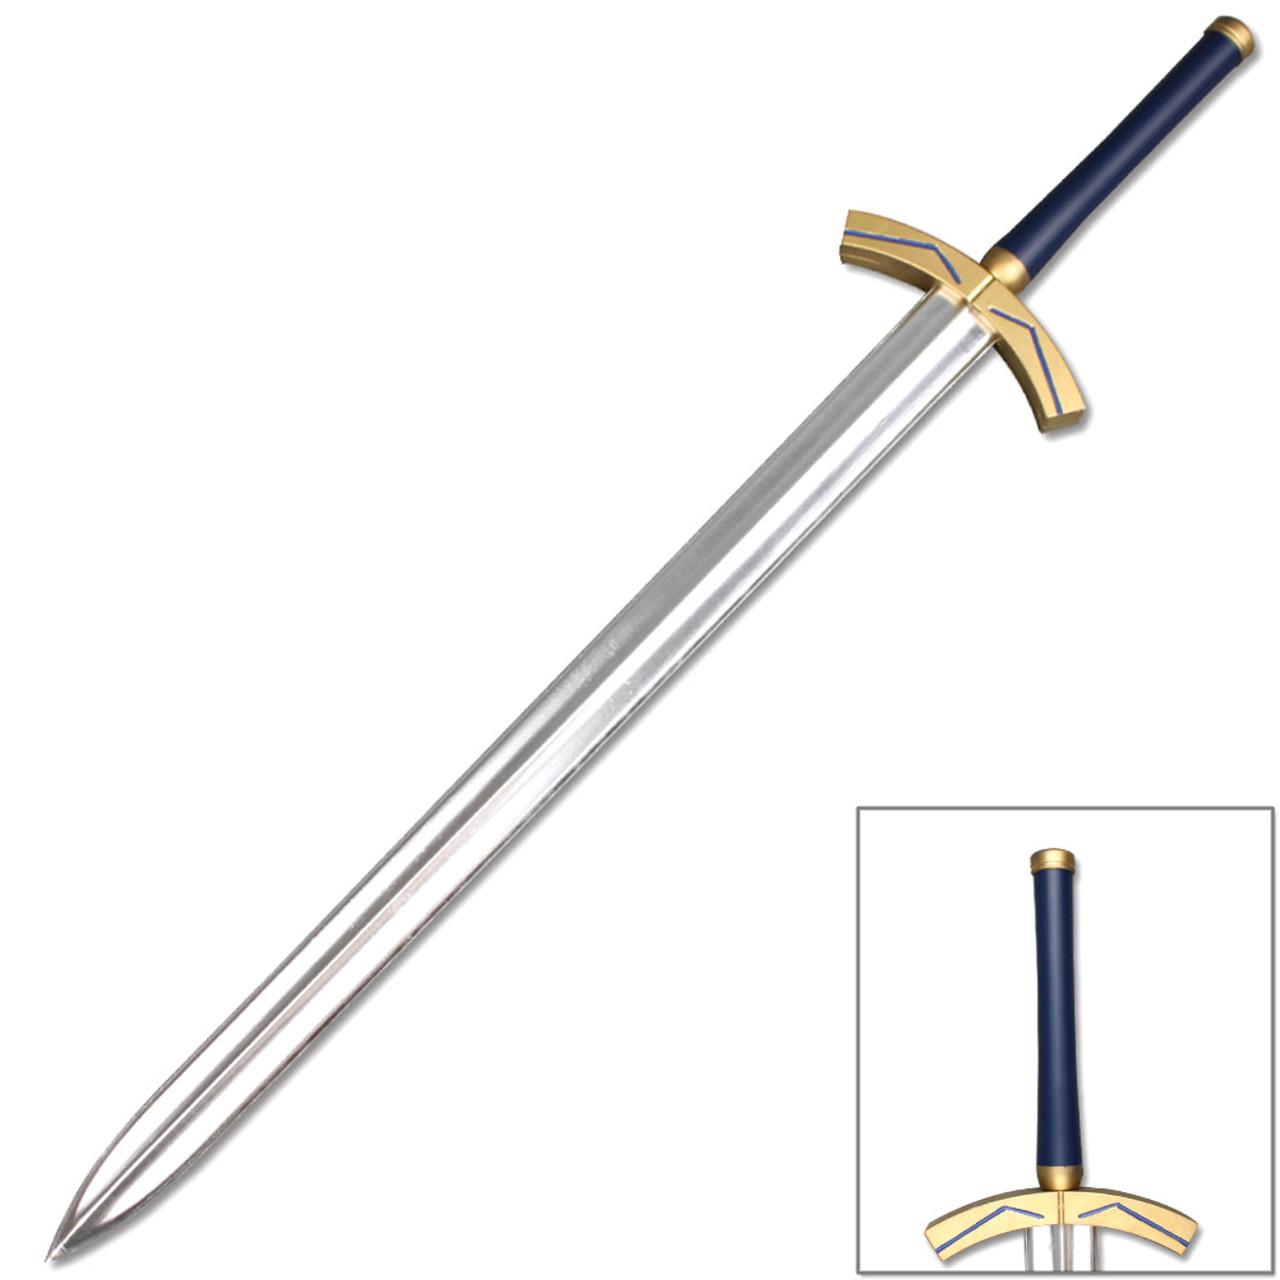 Saber's Excalibur FOAM Sword Fate TYPE-MOON Noble Phantasm Cosplay LARP Replica - Edge Import